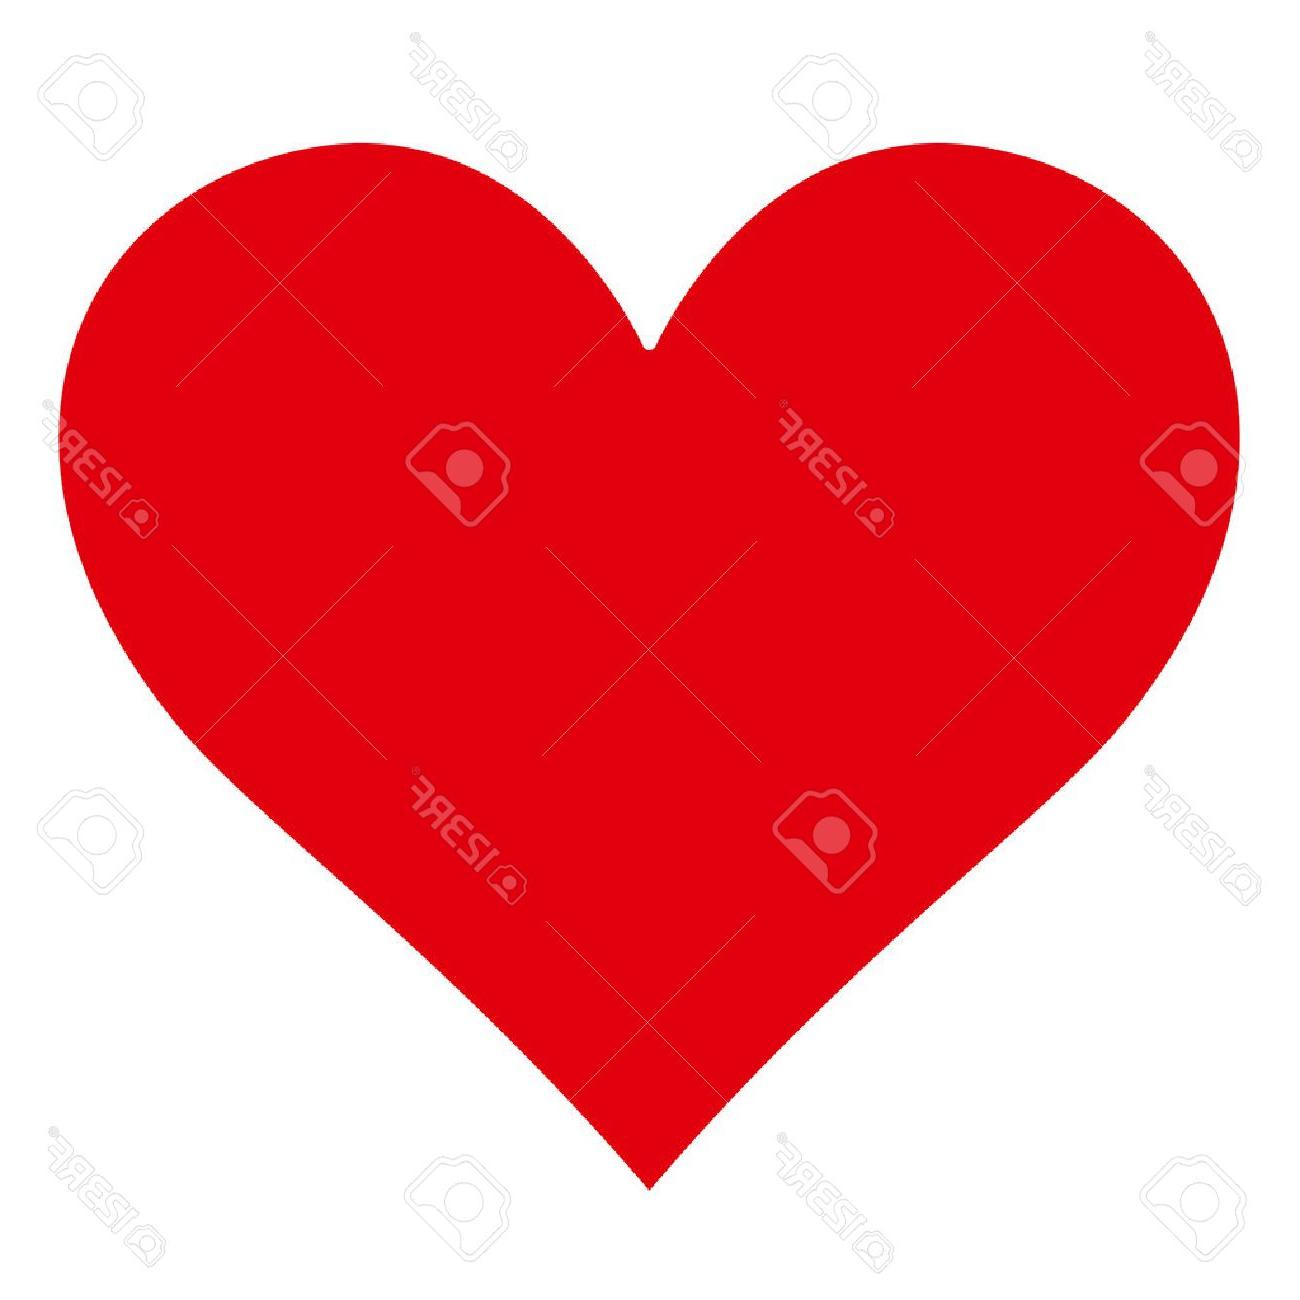 Best Simple Heart Clip Art Photos » Free Vector Art, Images.